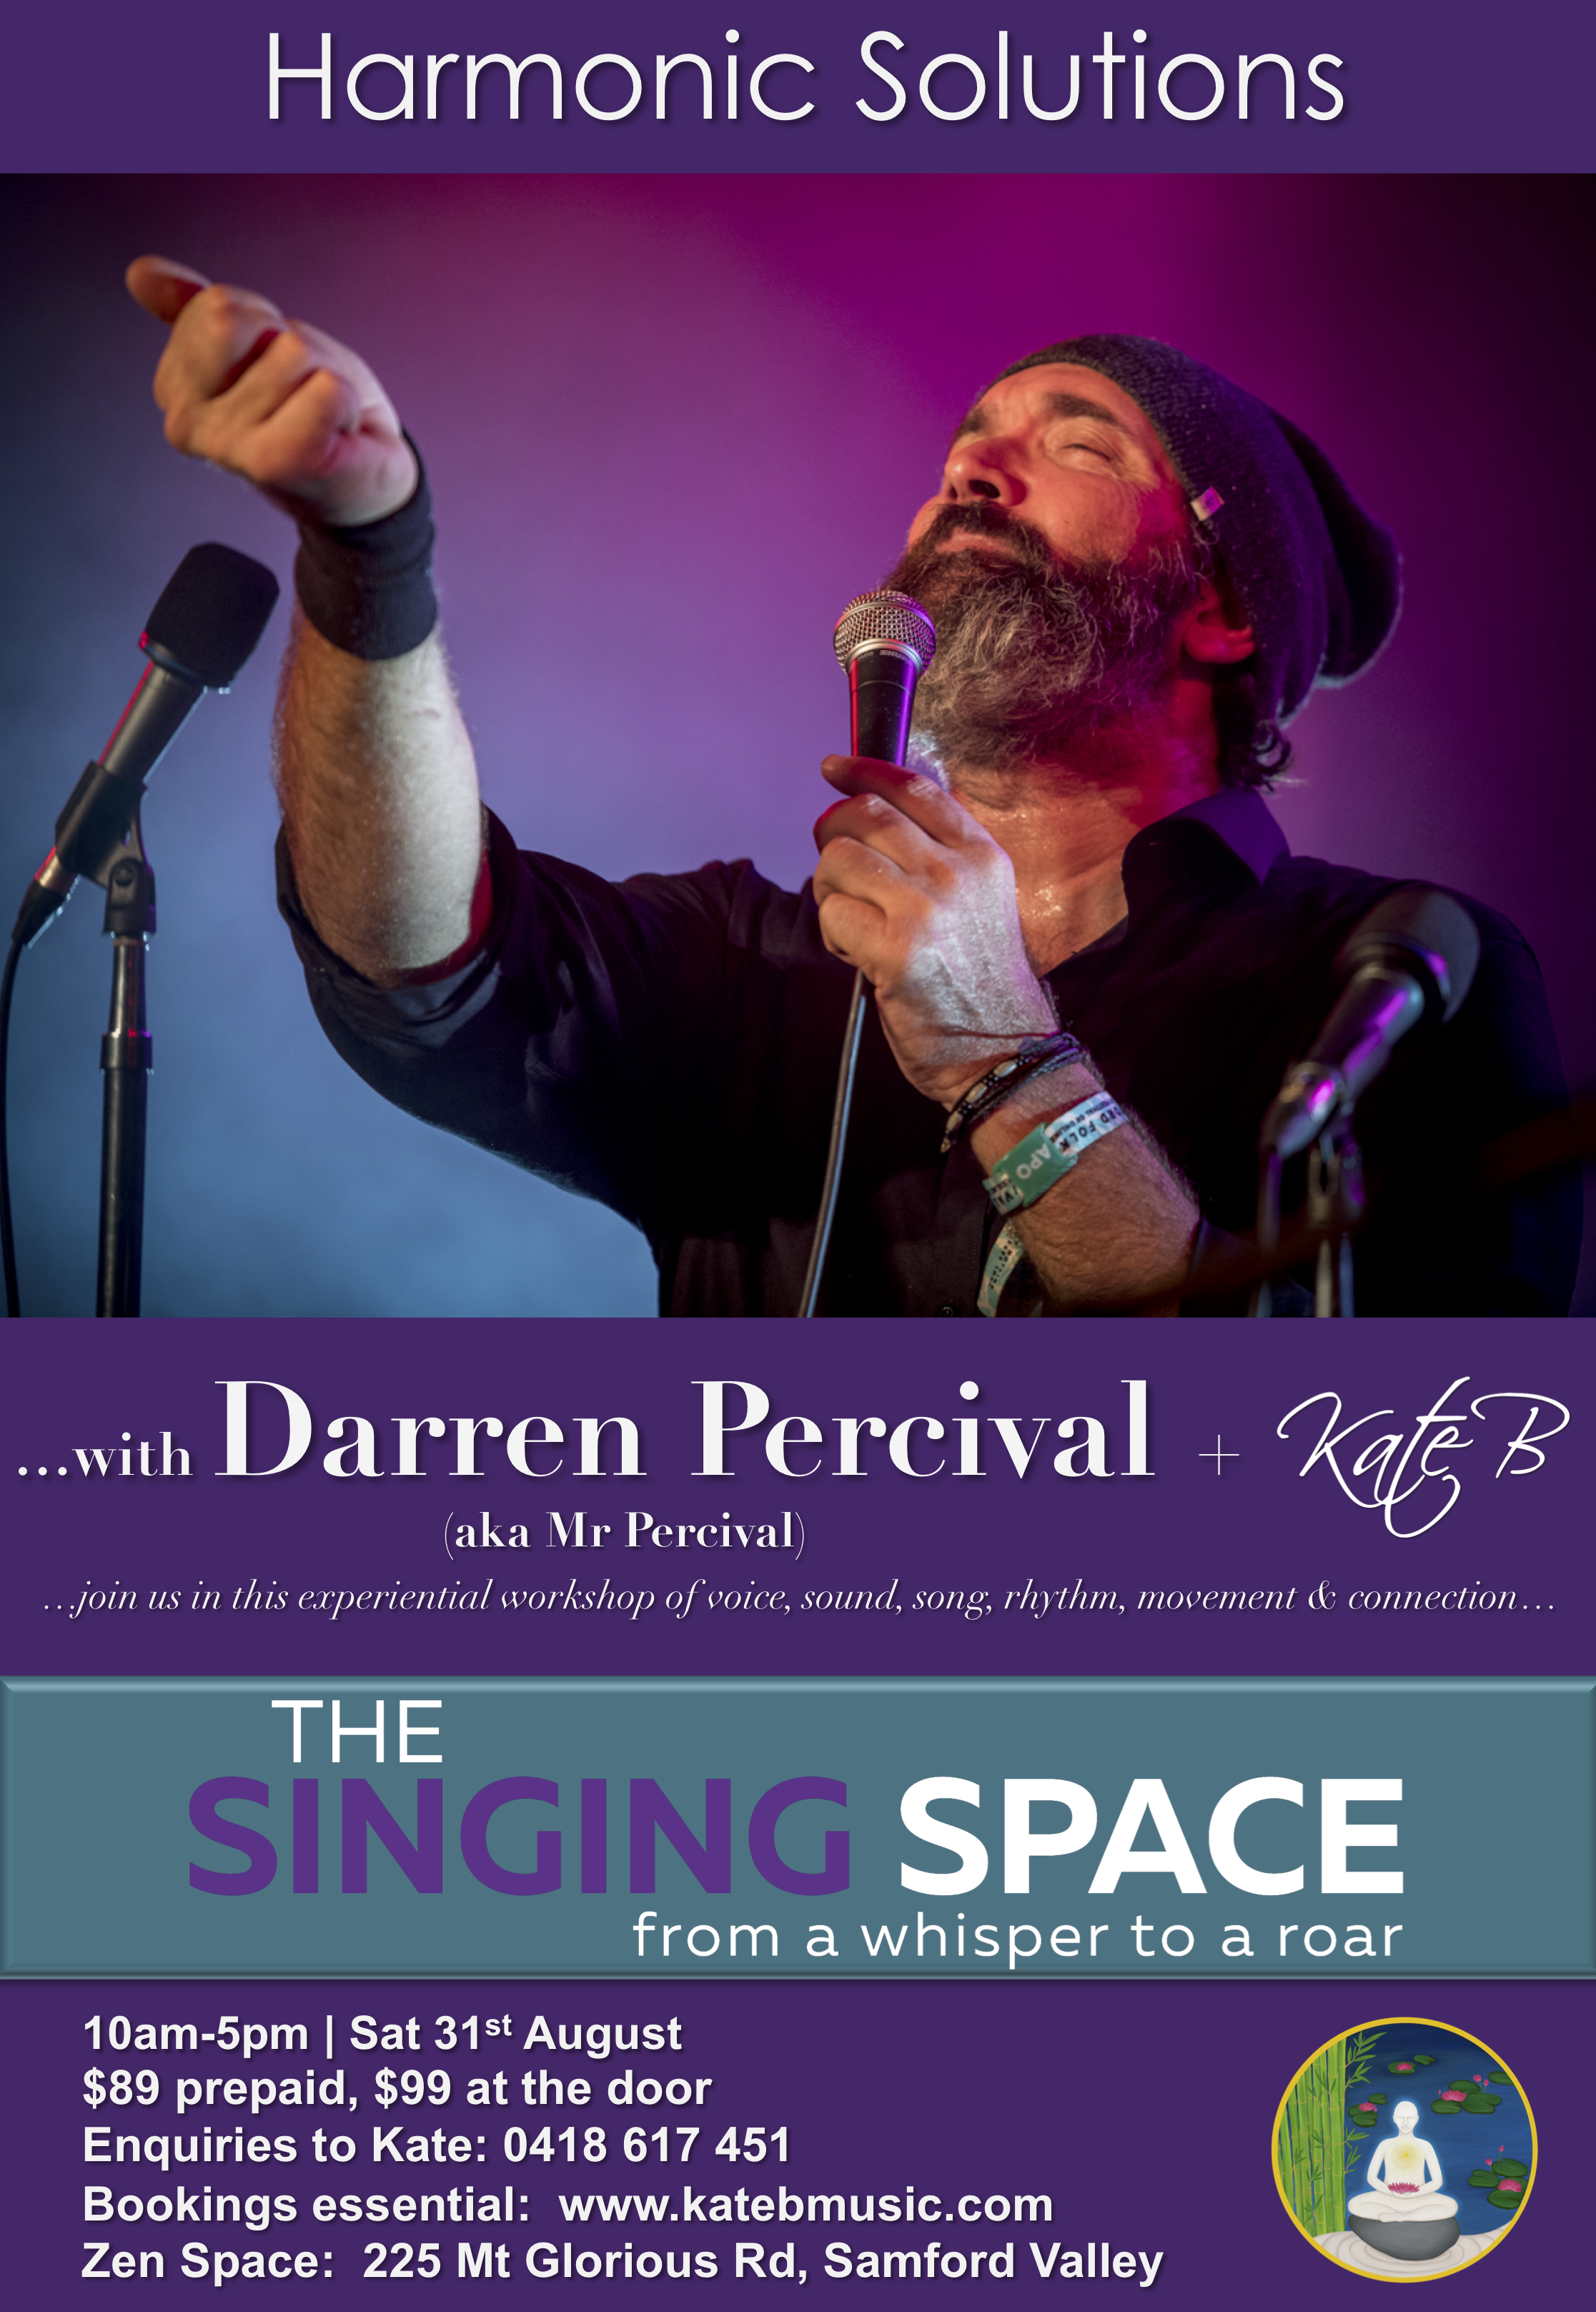 Harmonic Solutions with Darren Percival